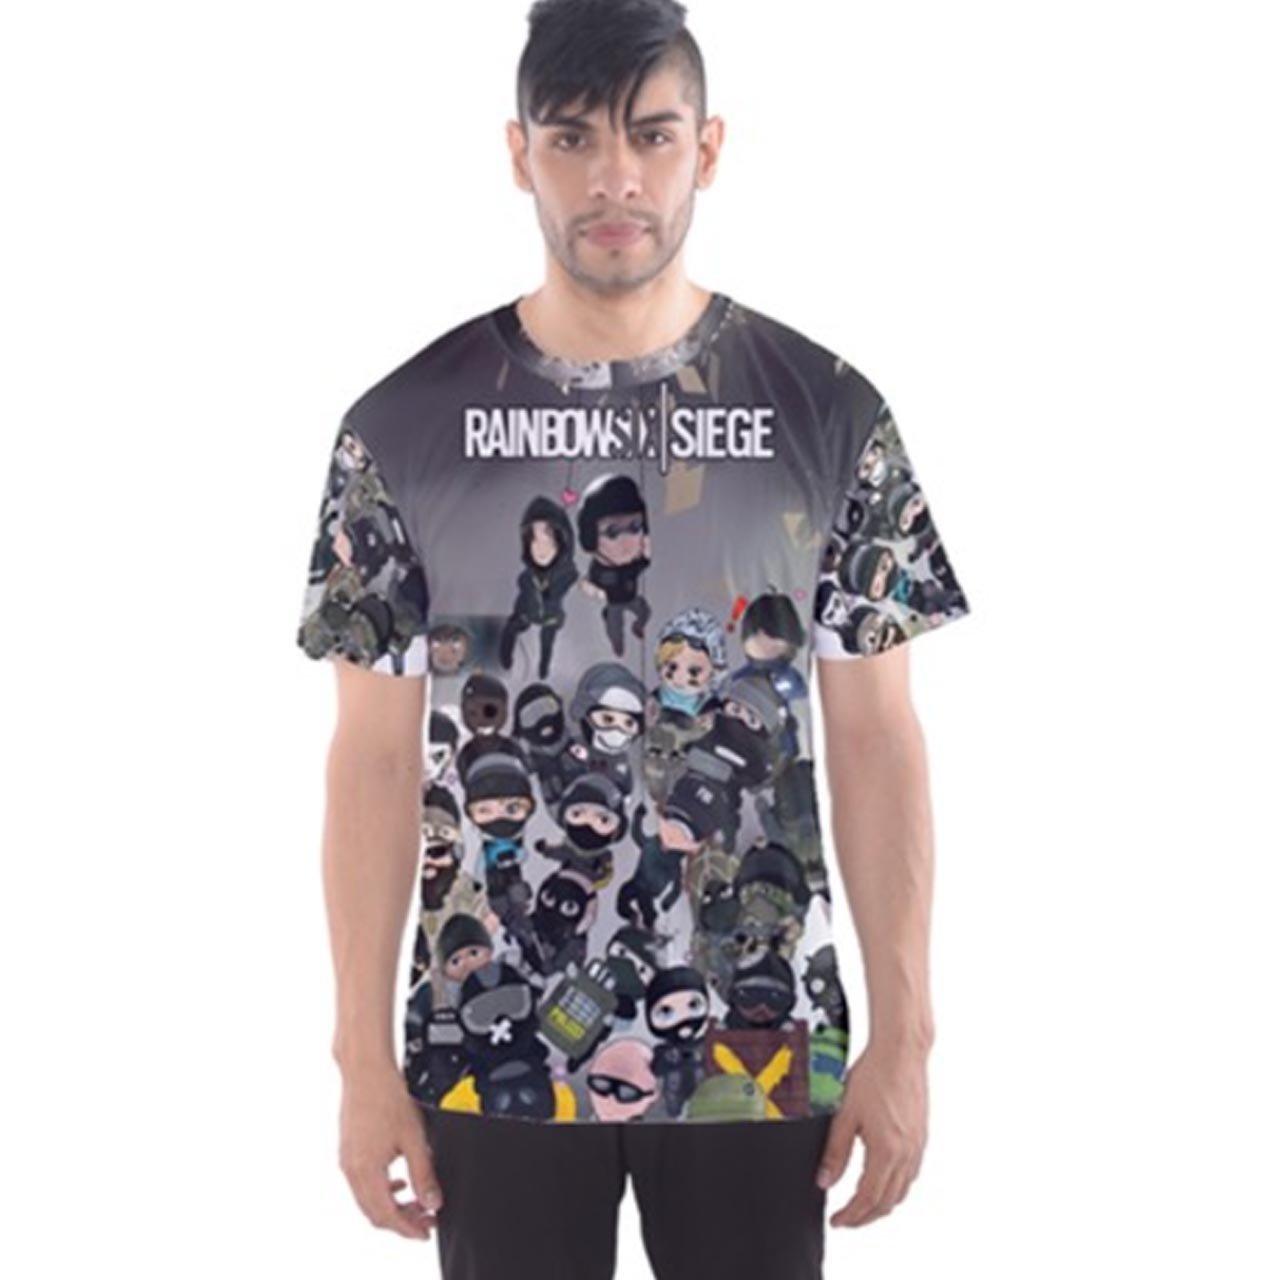 Rainbow Six Siege ChibisメンズTシャツTee Fullprint TシャツサイズM   B075LB8PZJ